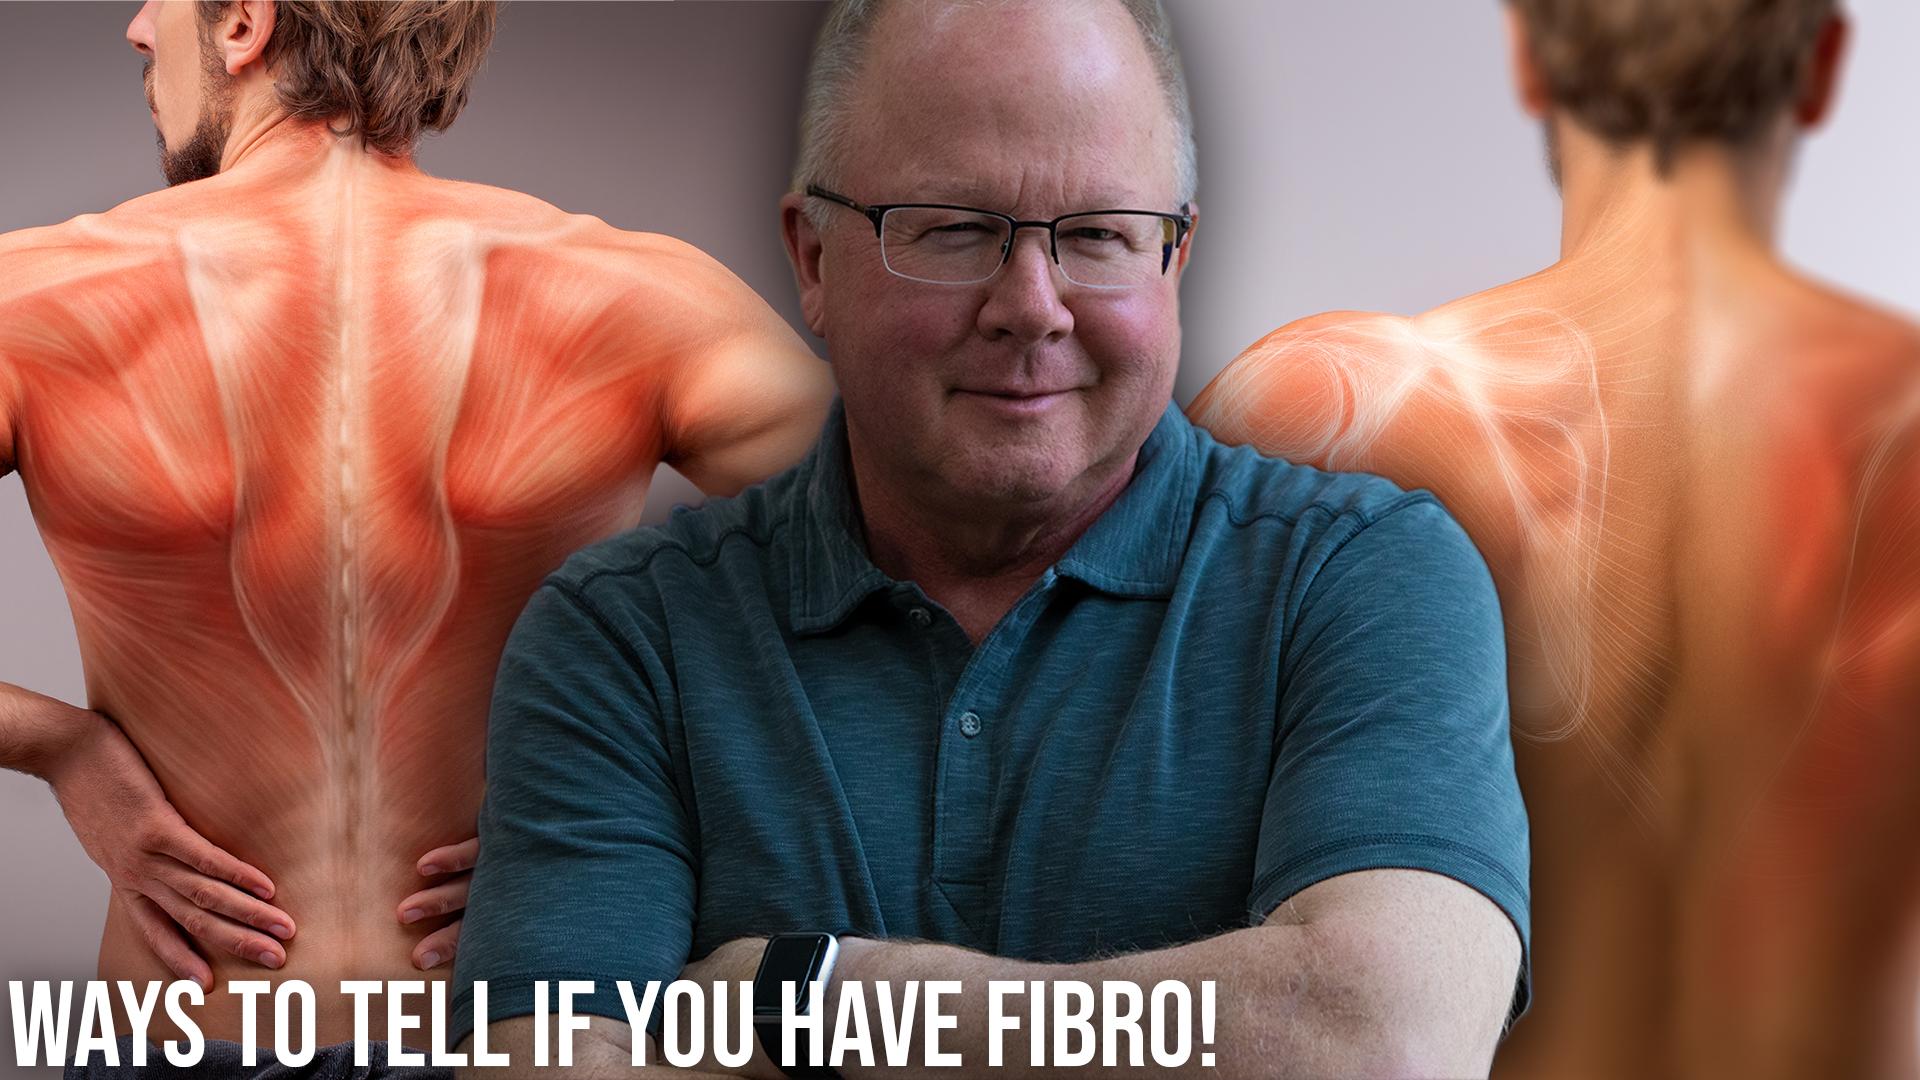 Ways To Tell If You Have Fibromyalgia!.jpg